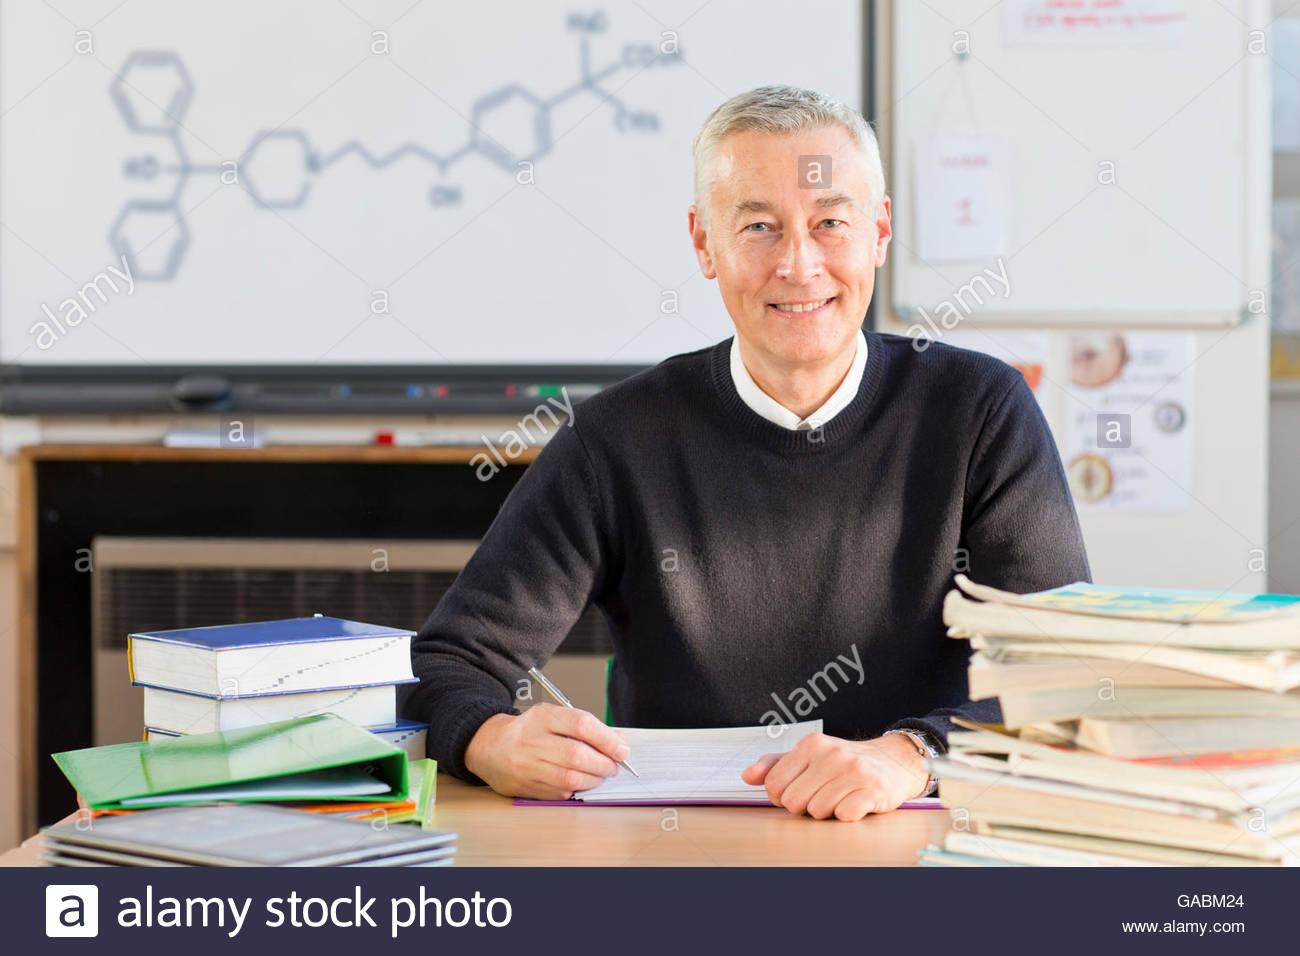 teacher grading homework stock photos teacher grading homework